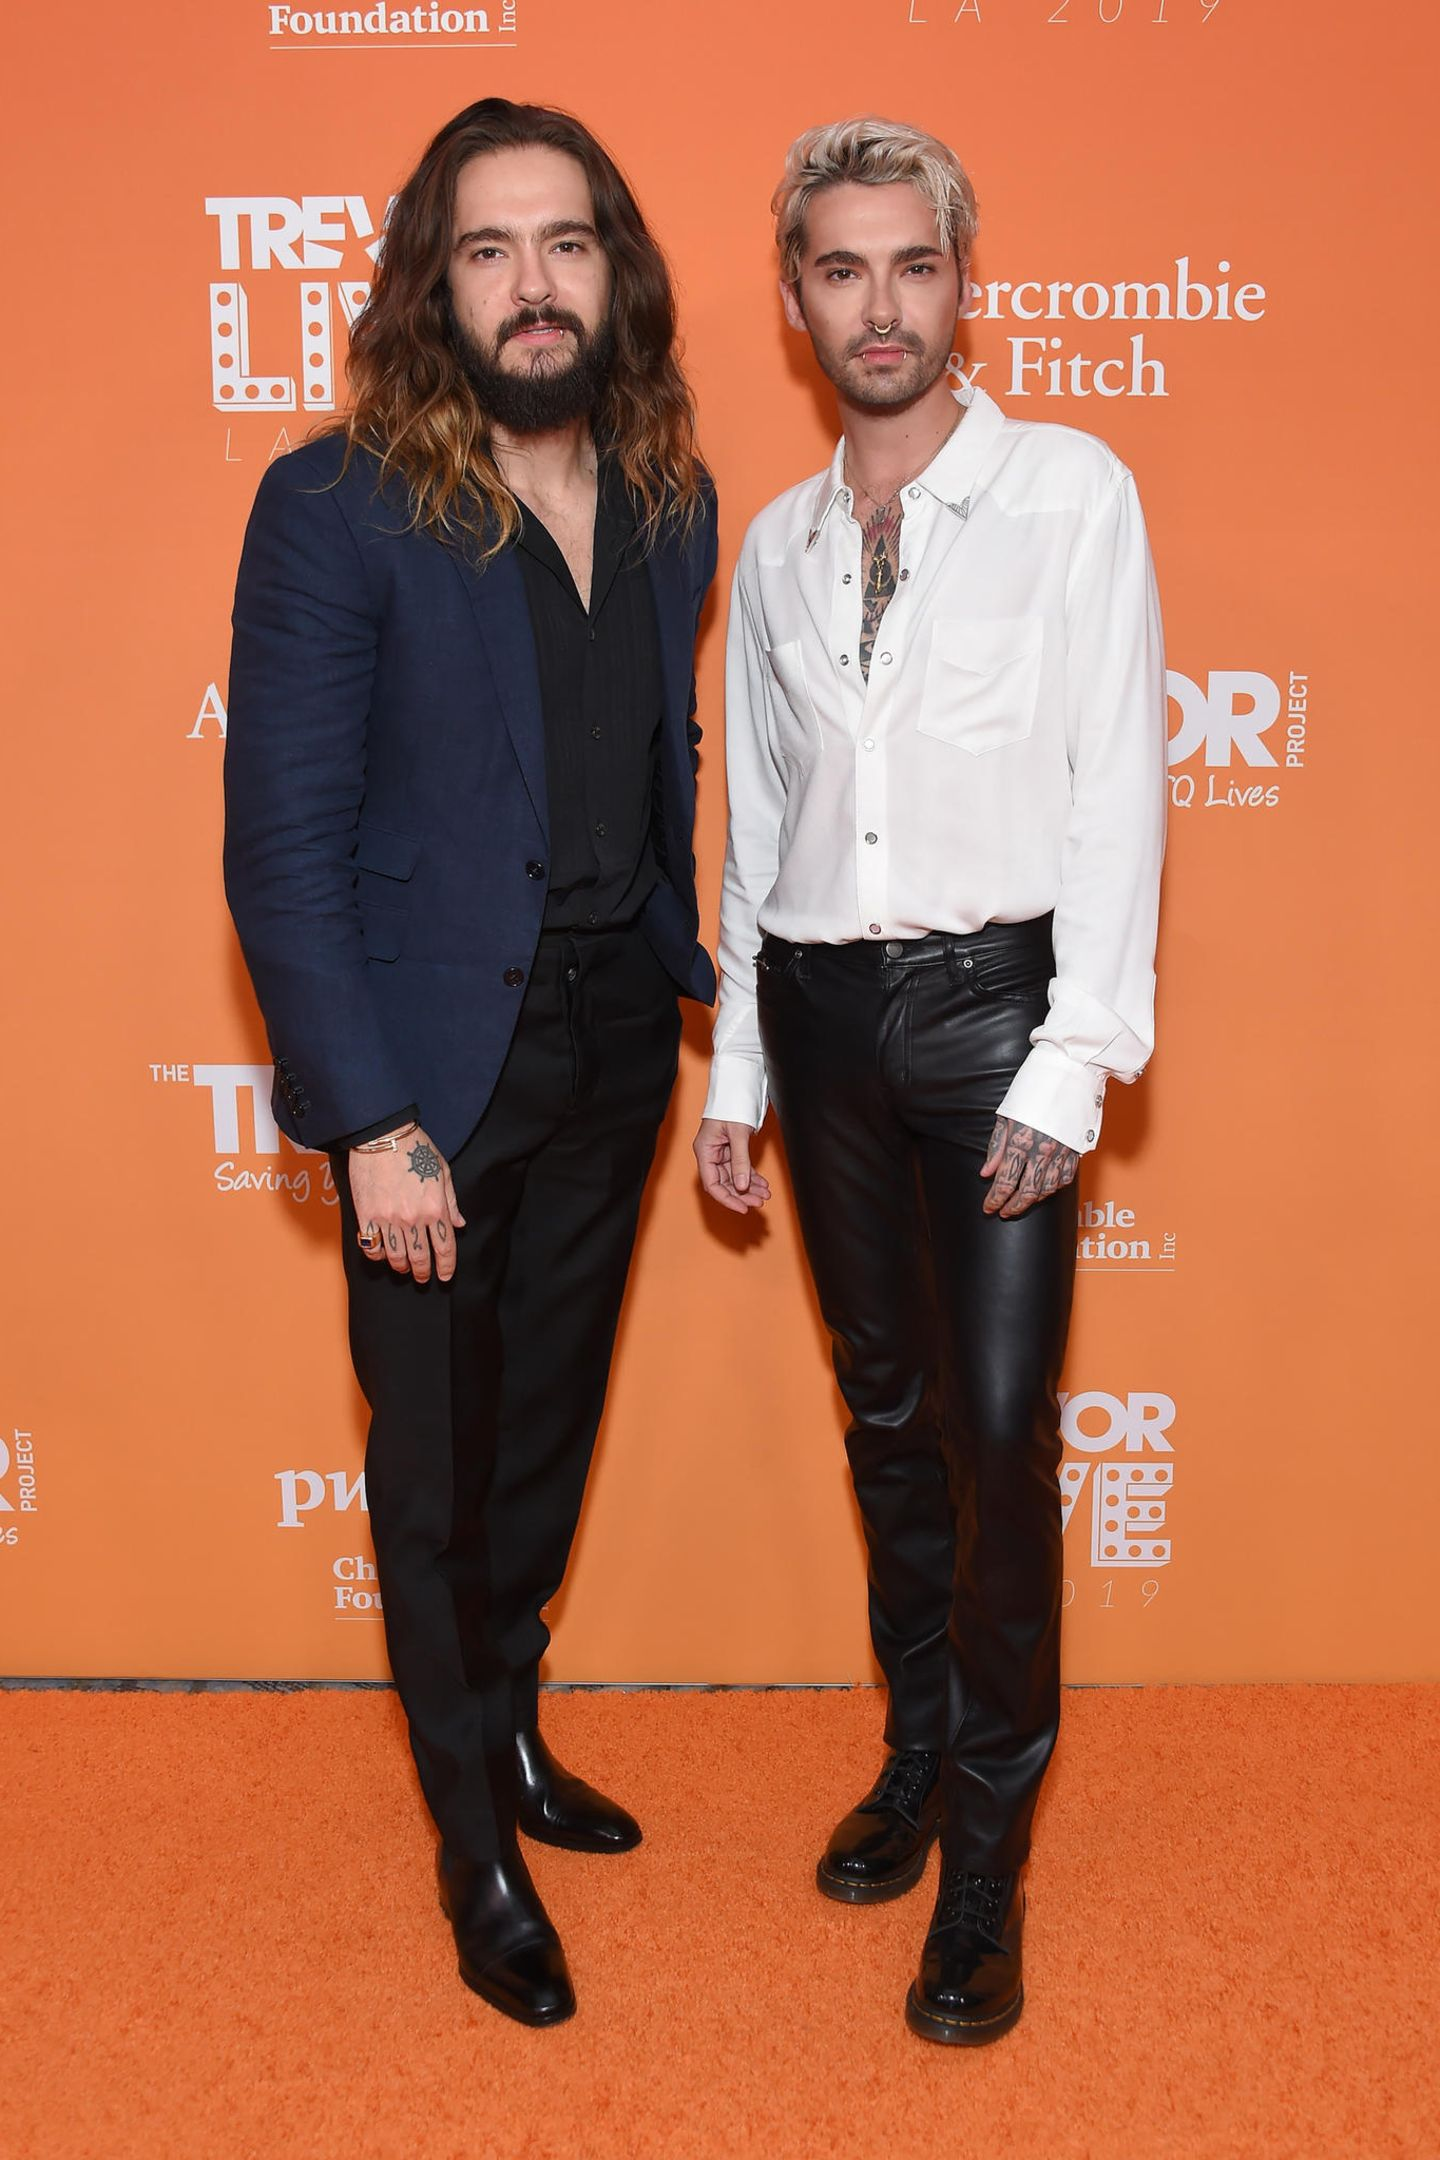 Tom Kaulitz + Bill Kaulitz